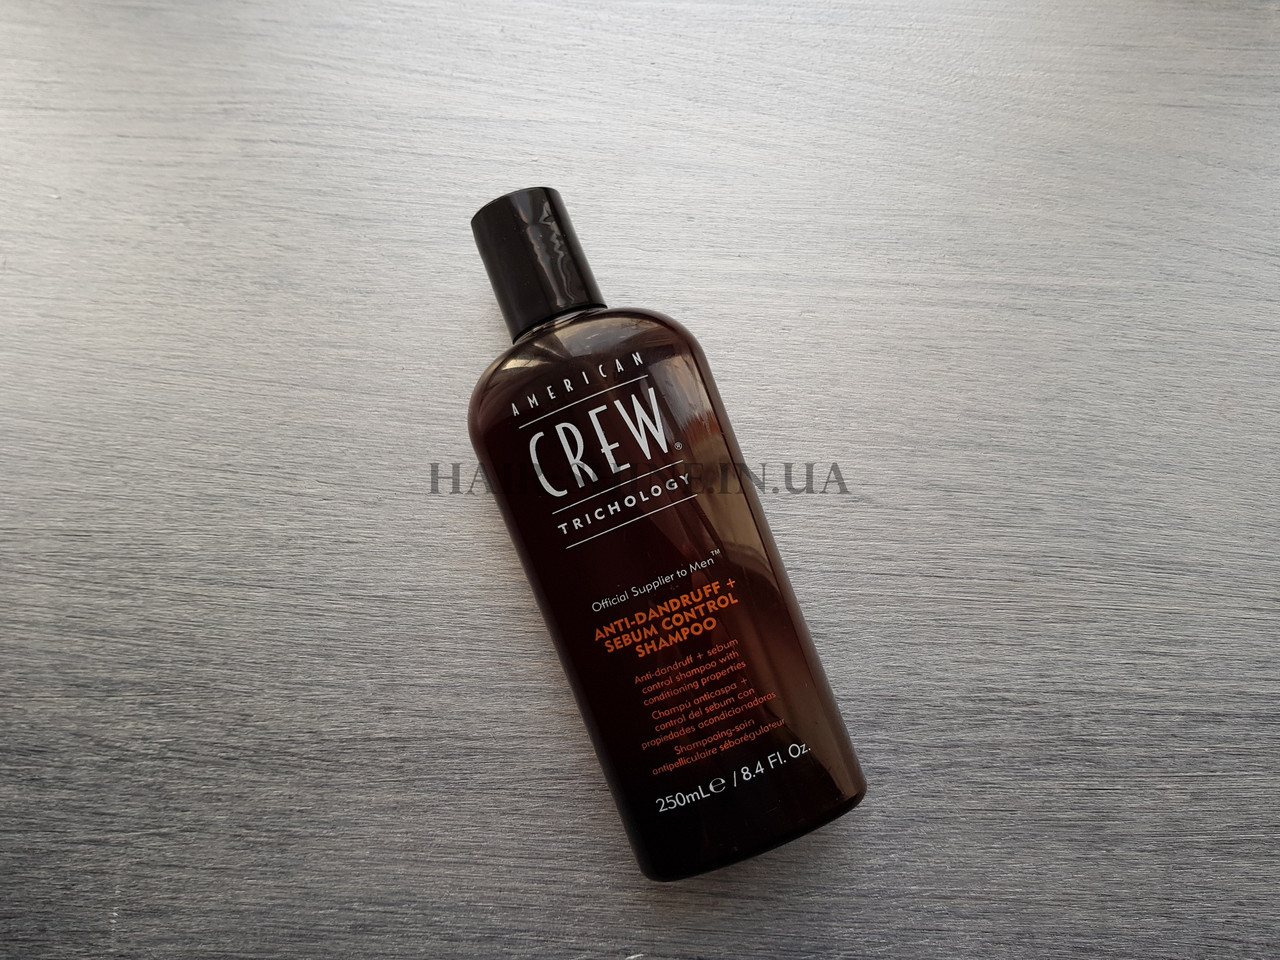 Балансирующий шампунь против перхоти для жирной кожи головы Anti Dandruff + Sebum Control Shampoo 250 мл